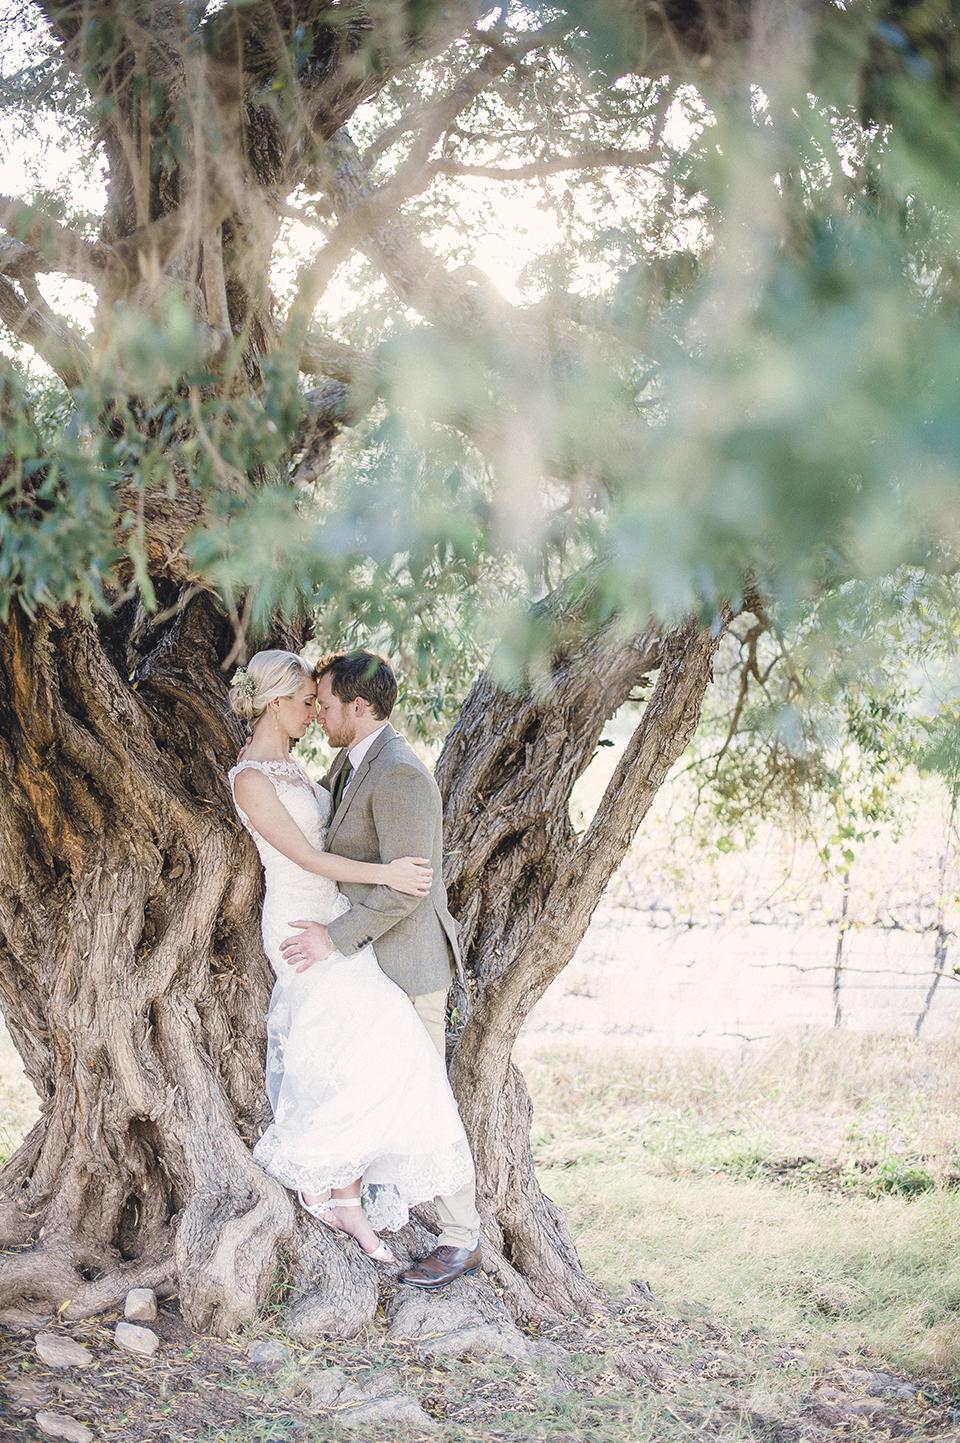 RyanParker_WeddingPhotographer_FineArt_CapeTown_Robertson_PatBusch_Hermanus_M&S_DSC_3474.jpg